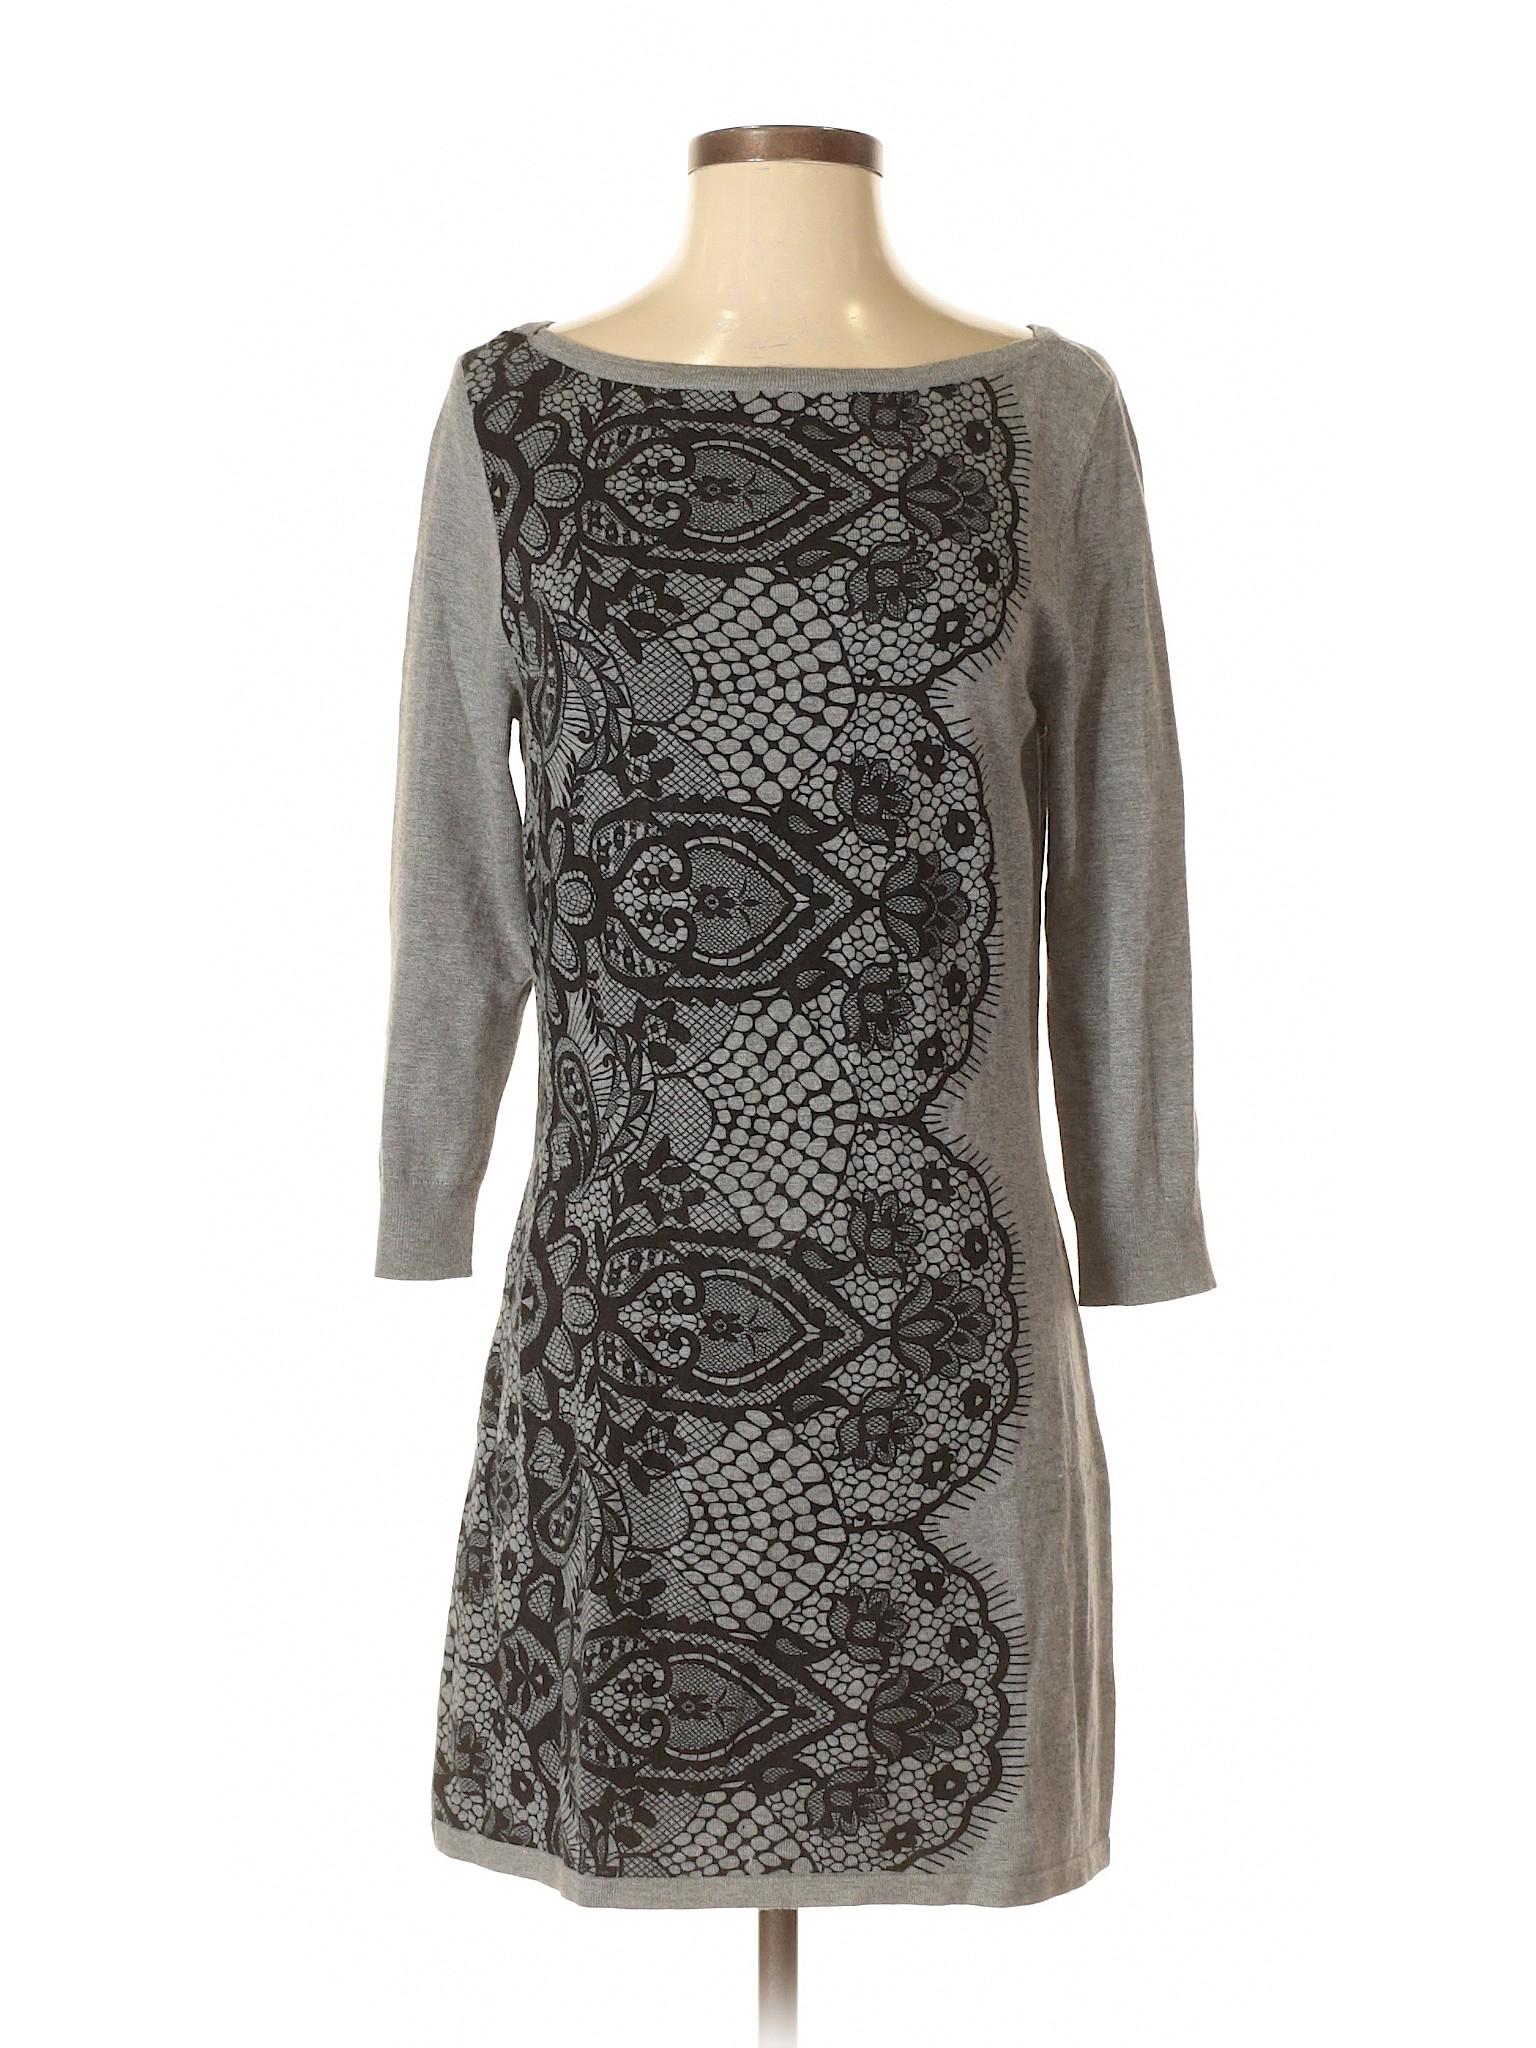 winter Boutique White Black Casual Market Dress House UBUxW4r6wp